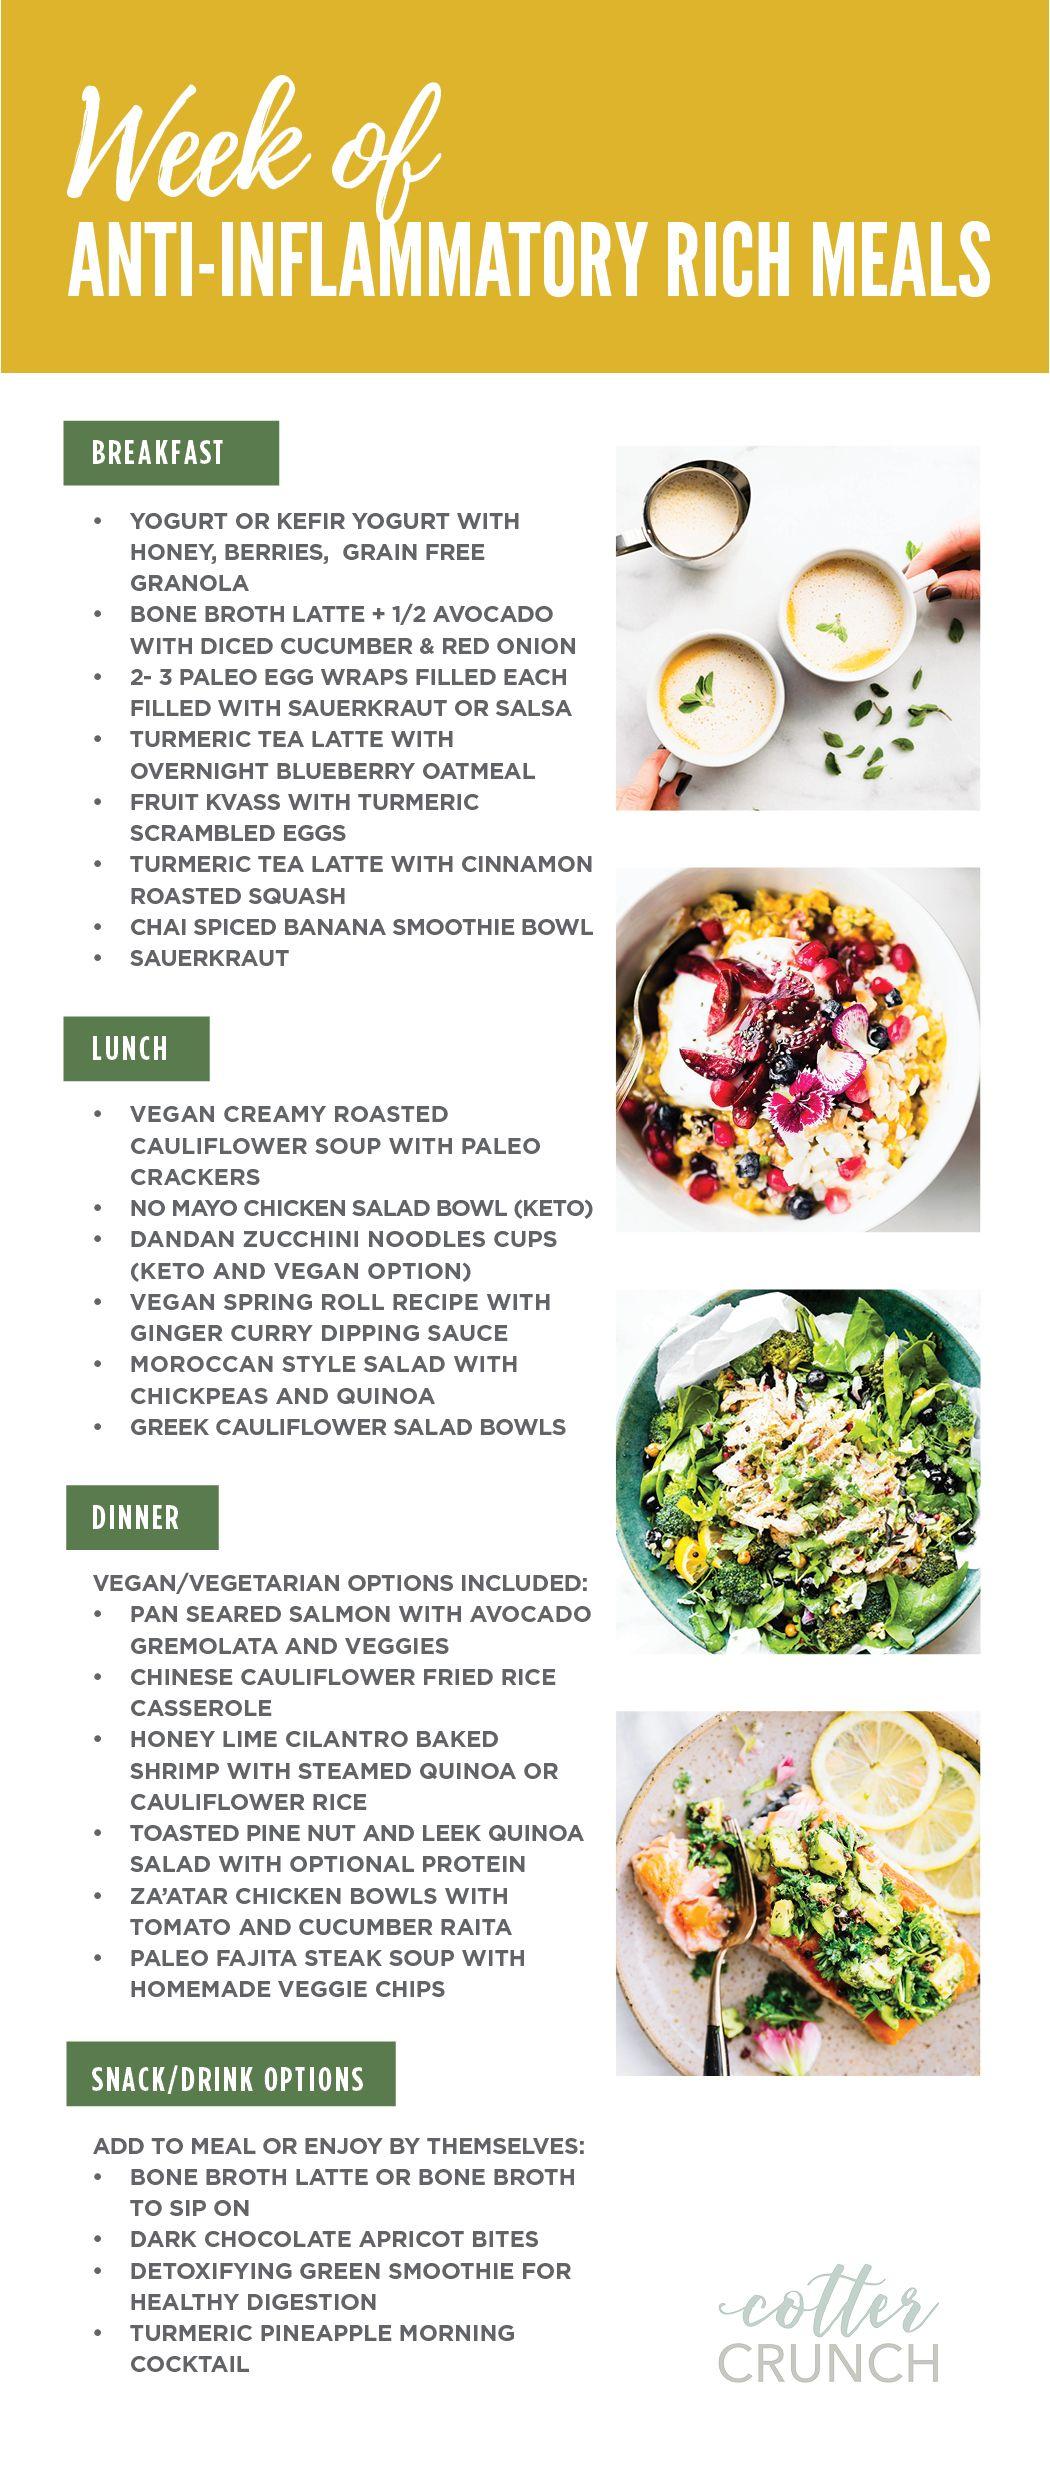 7 Day Anti Inflammatory Diet Kick Start Or Reset Guide Cotter Crunch Anti Inflammatory Diet Recipes Anti Inflammatory Recipes Anti Inflammatory Foods List